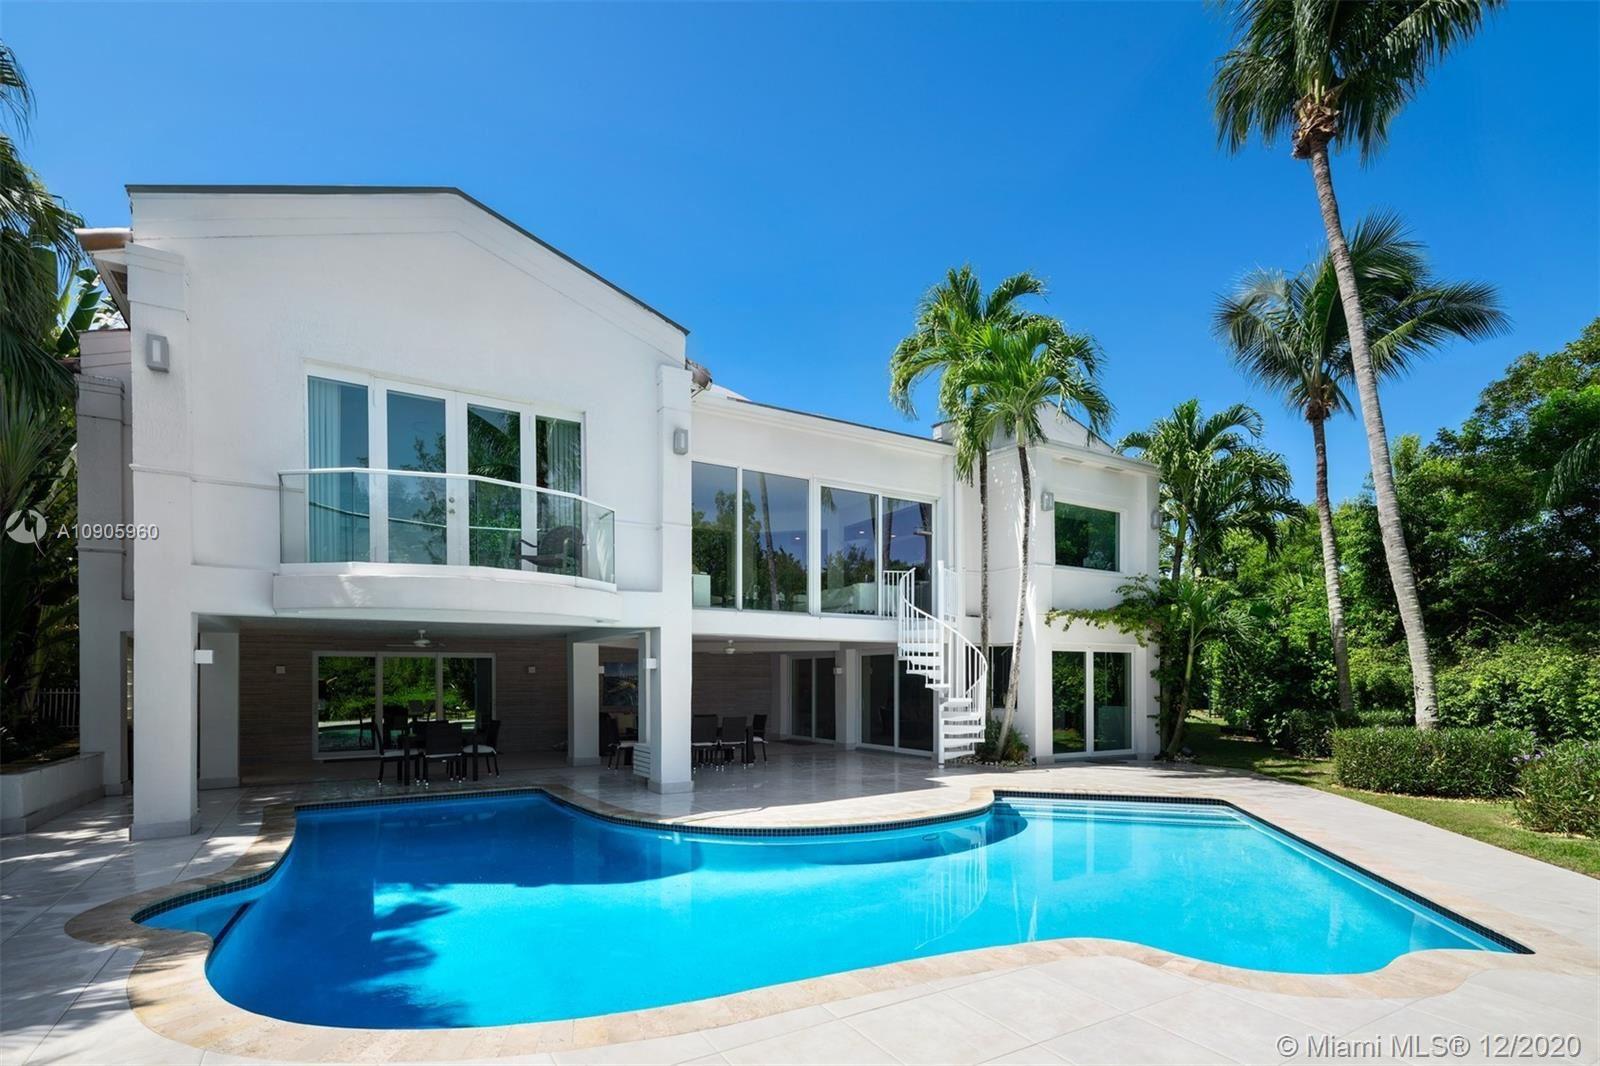 117 Gavilan Ave, Coral Gables, FL 33143 - #: A10905960